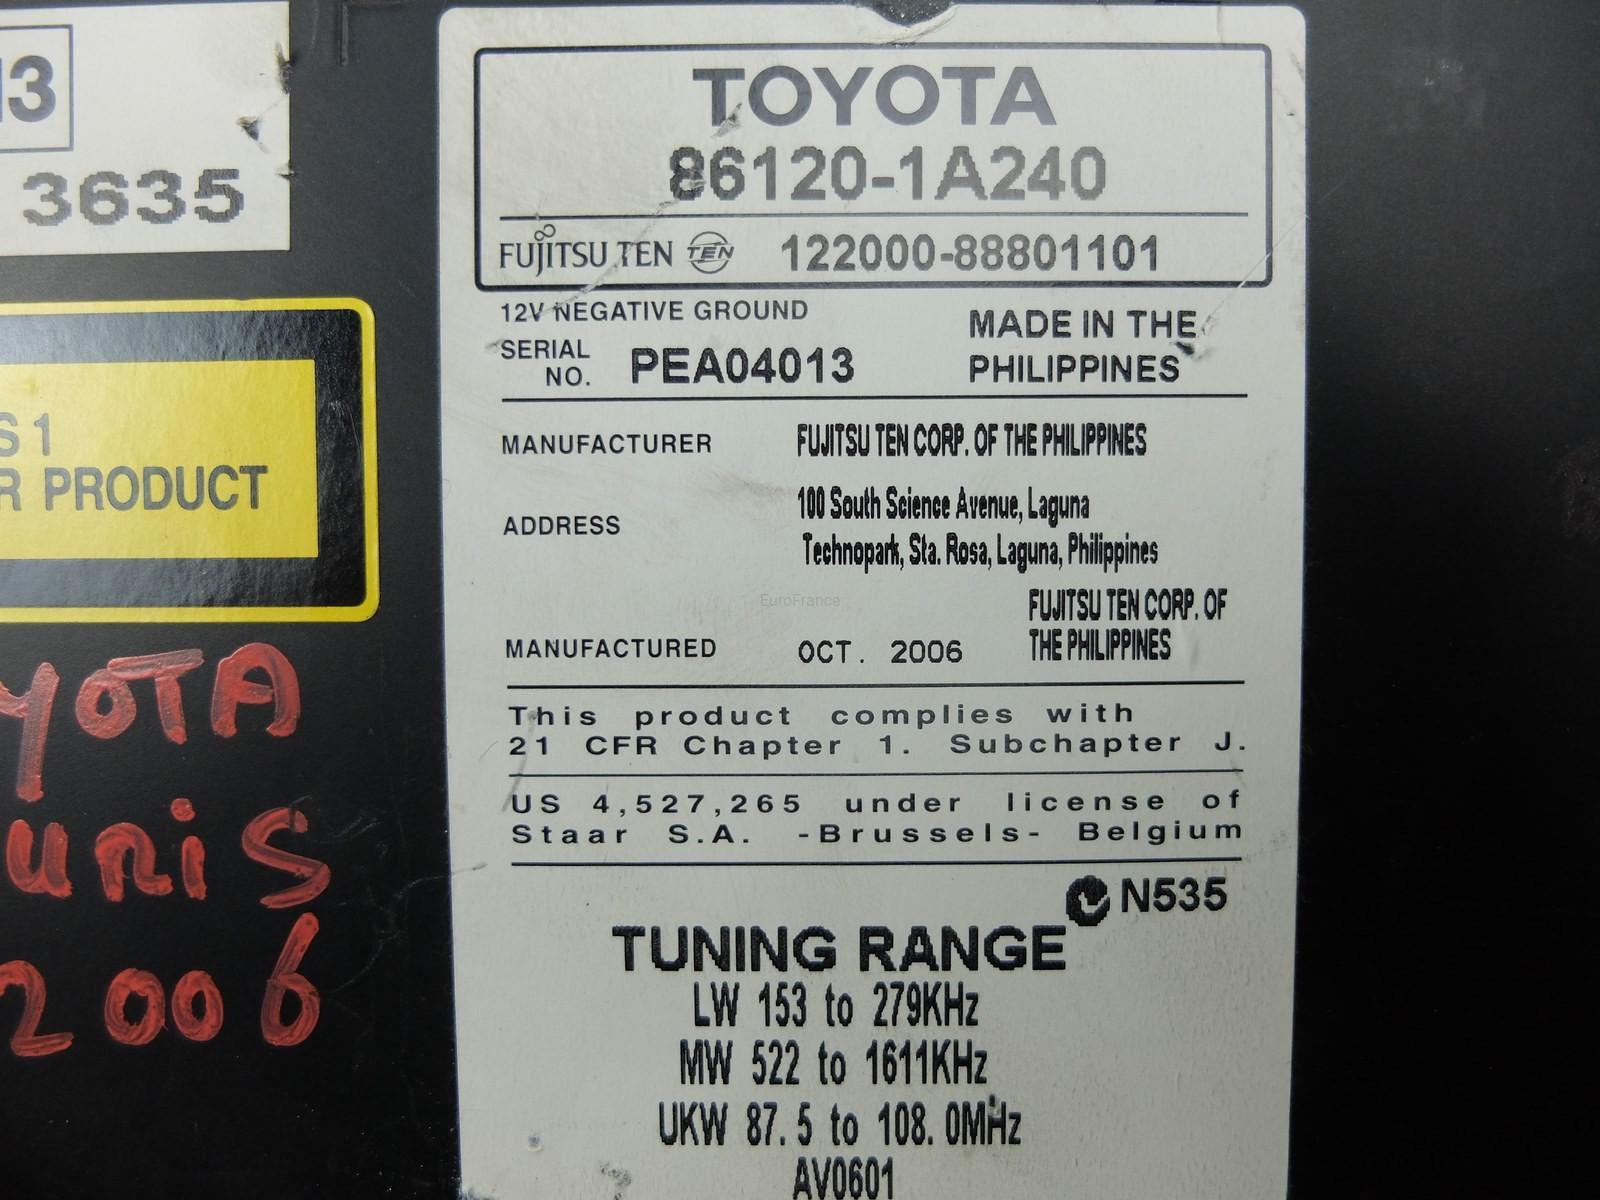 Radio Cd Mp3 Toyota Auris 1A240